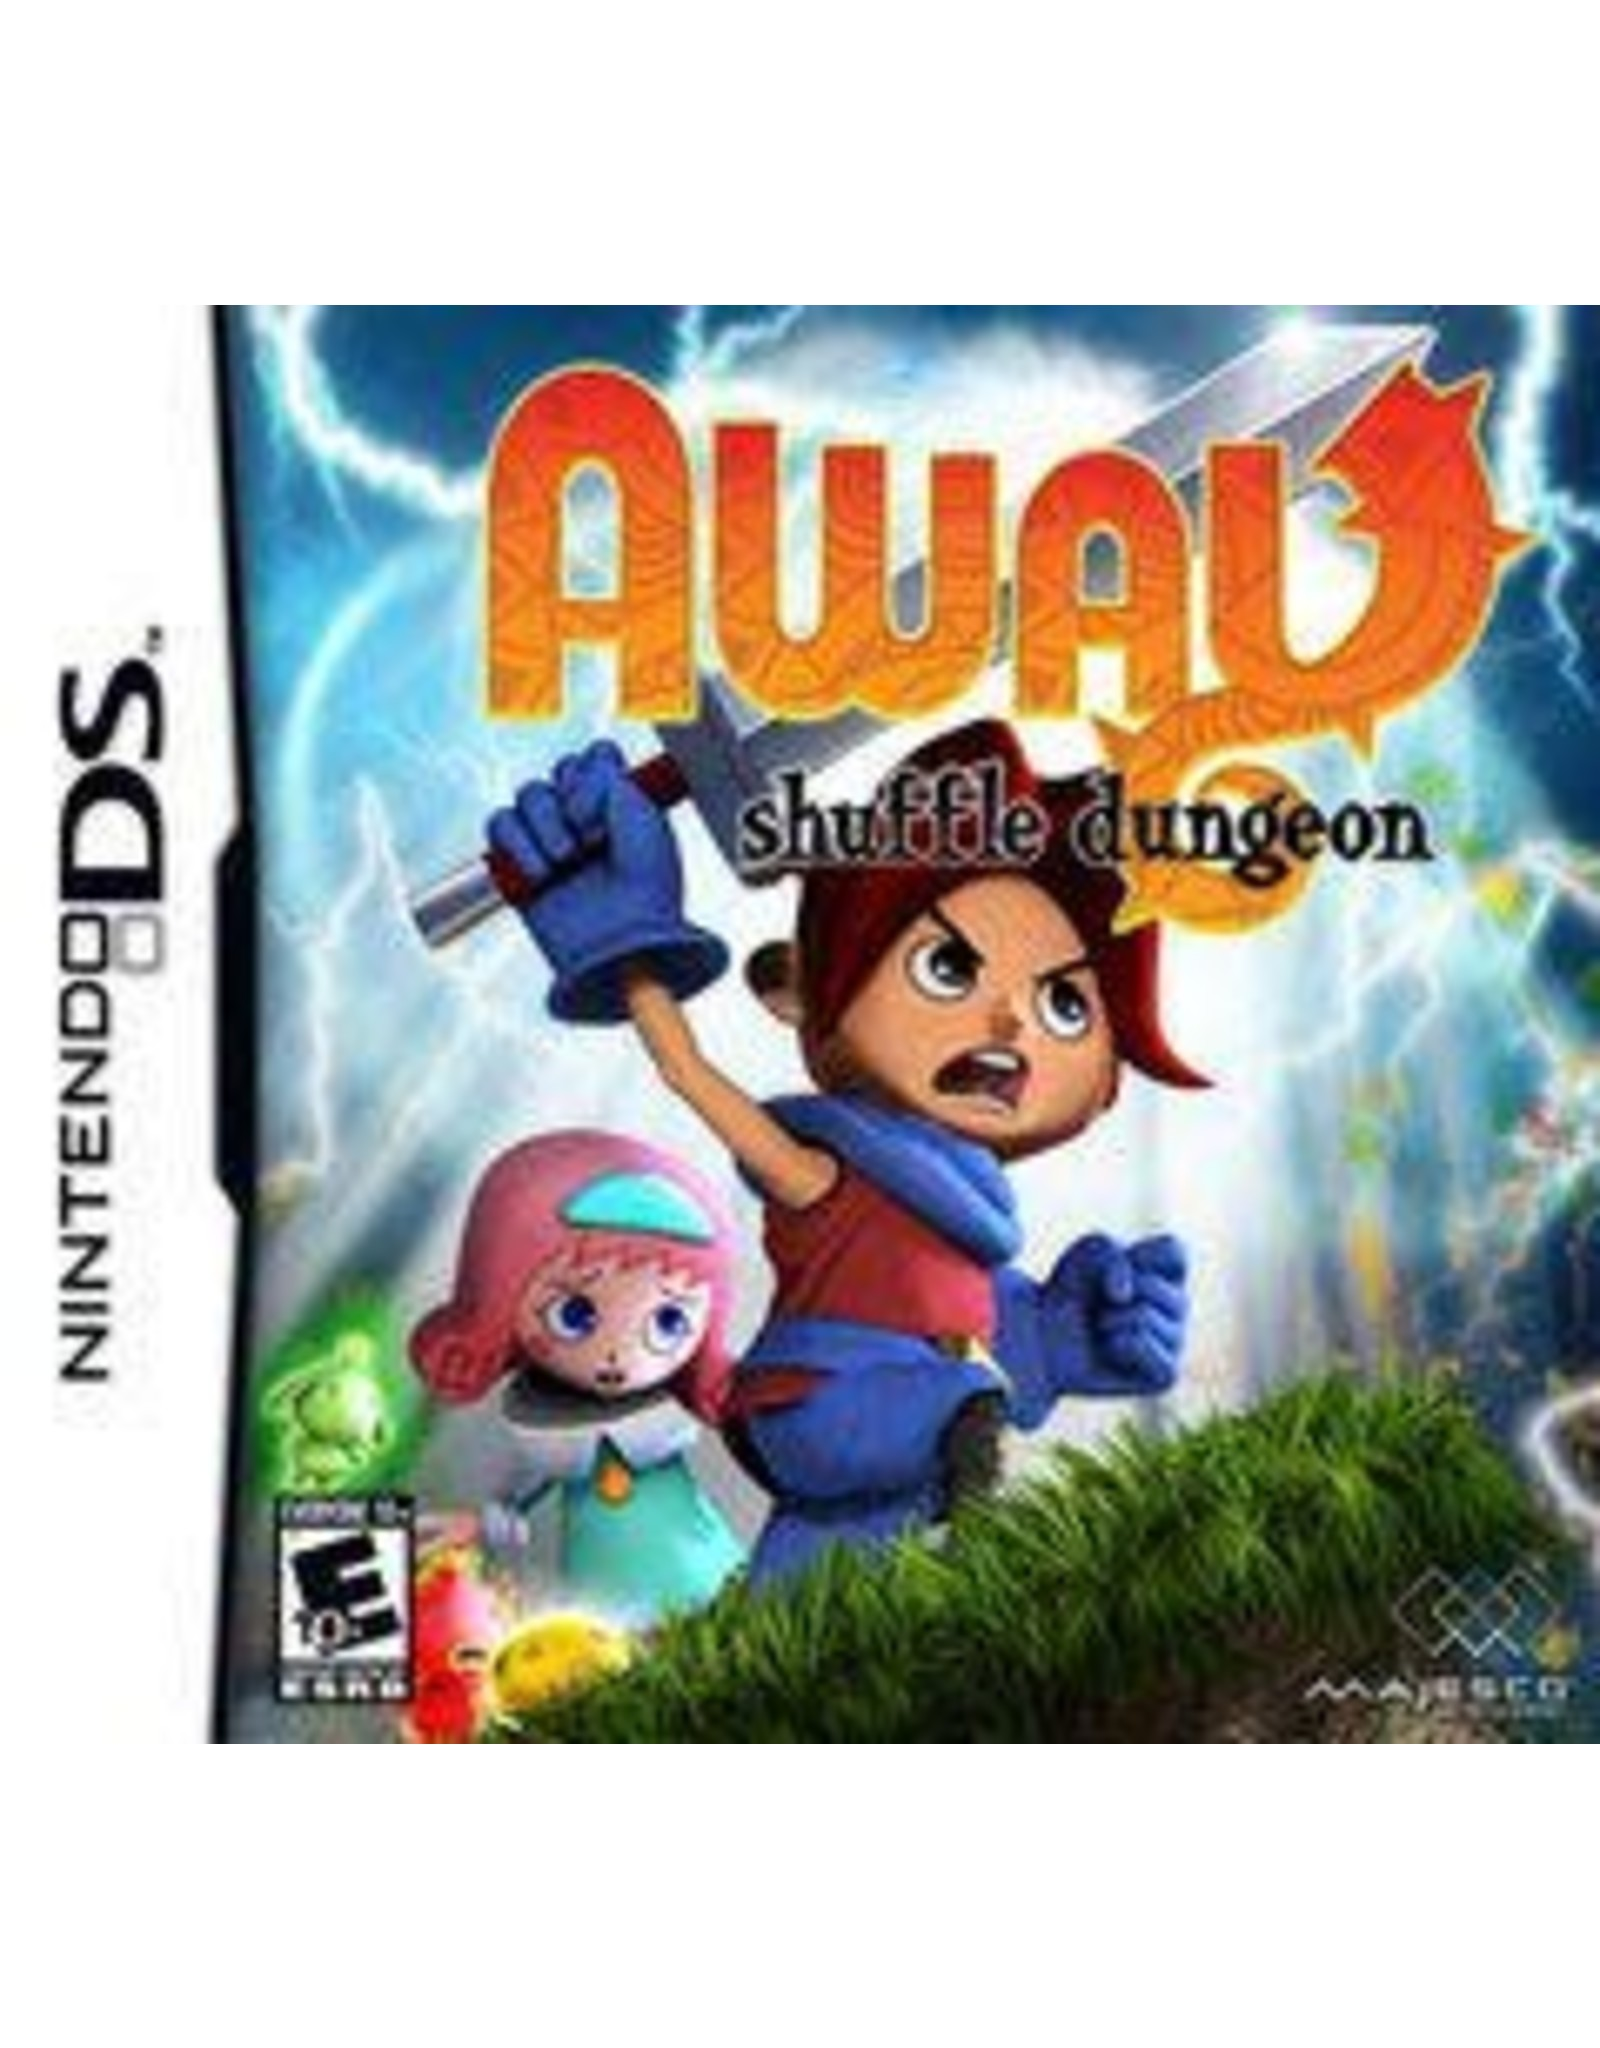 Nintendo DS Away: Shuffle Dungeon (Cart Only)